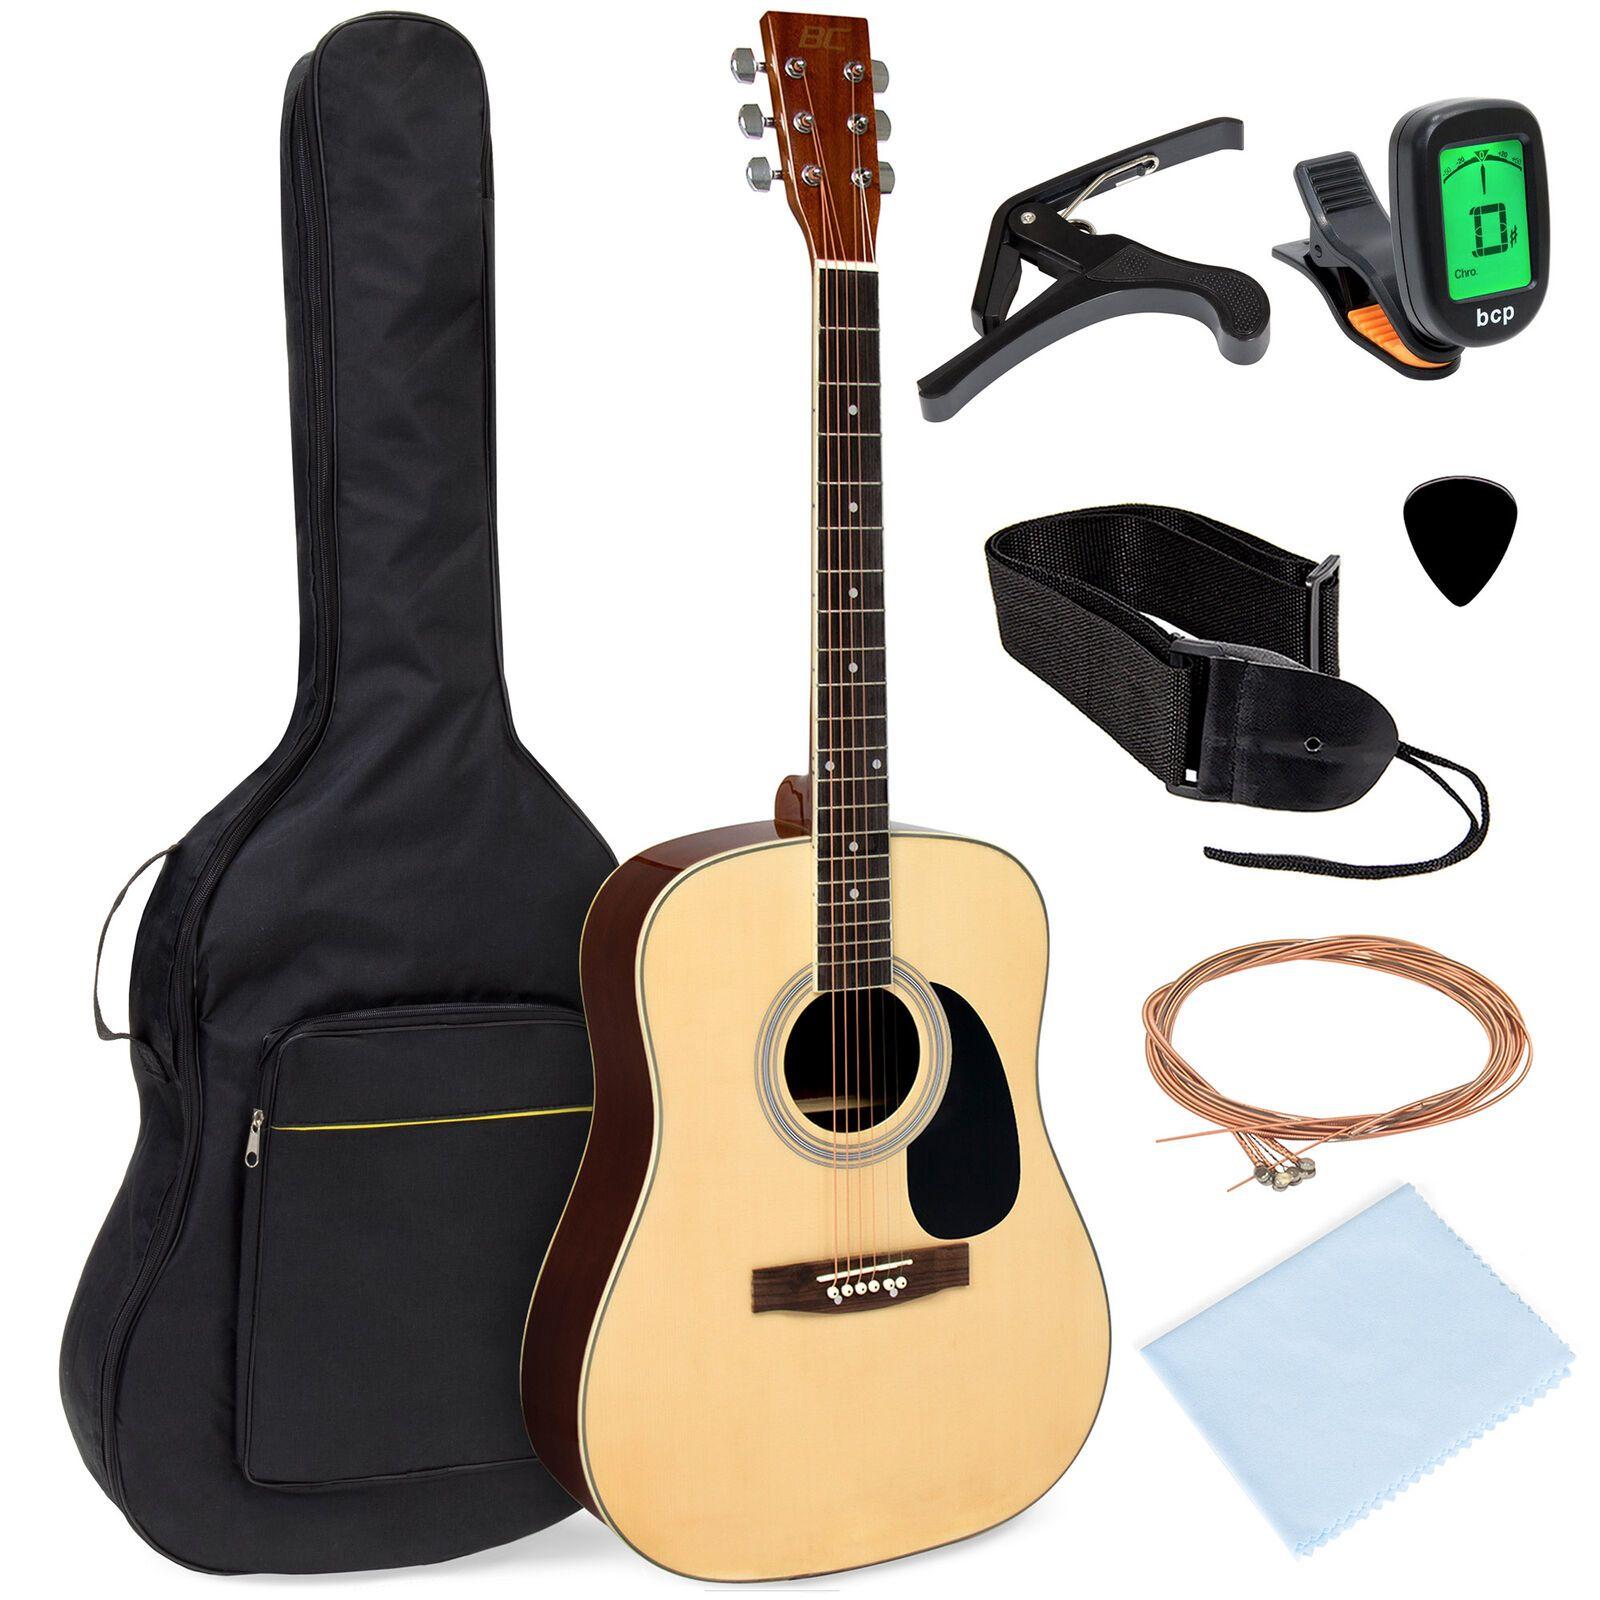 Bcp 41in Acoustic Guitar Starter Kit W Digital Tuner Padded Case Picks Strap Best Acoustic Guitar Guitar Kits Acoustic Guitar